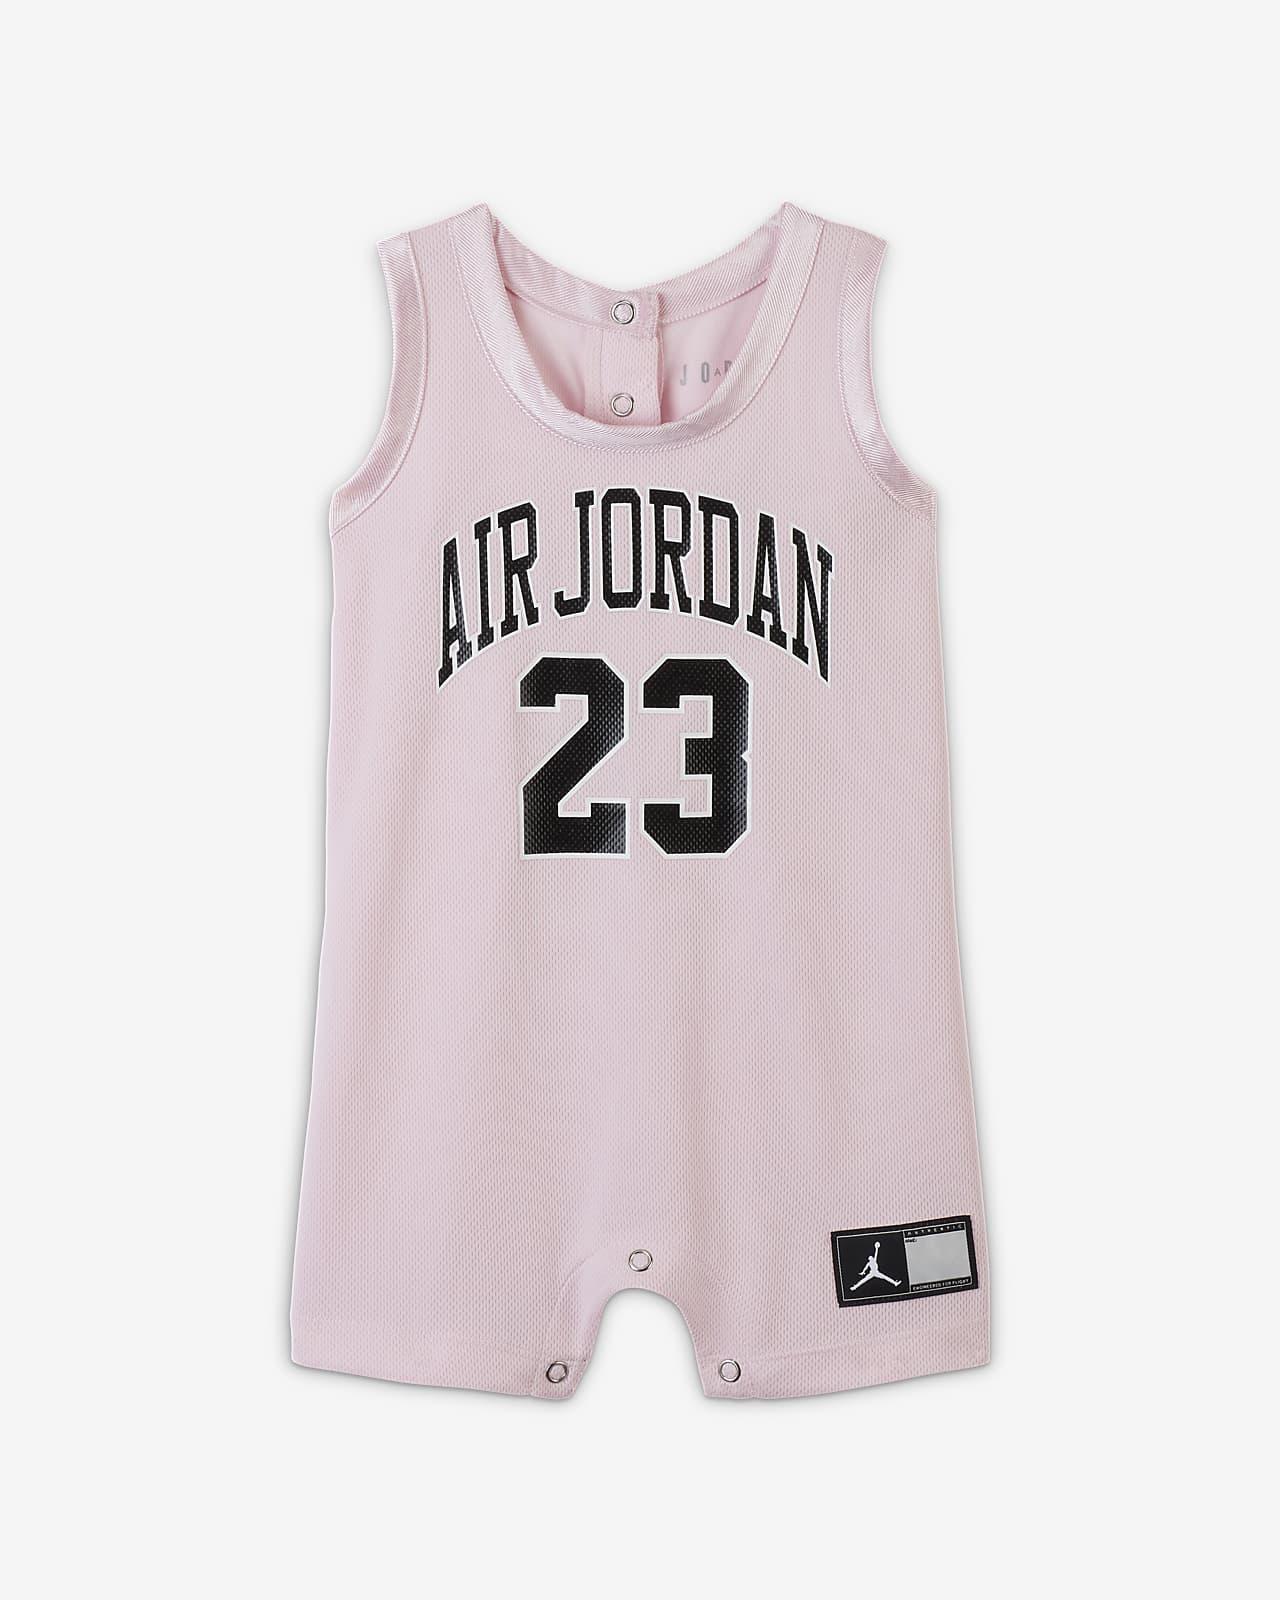 Jordan DNA Baby (12–24M) Romper